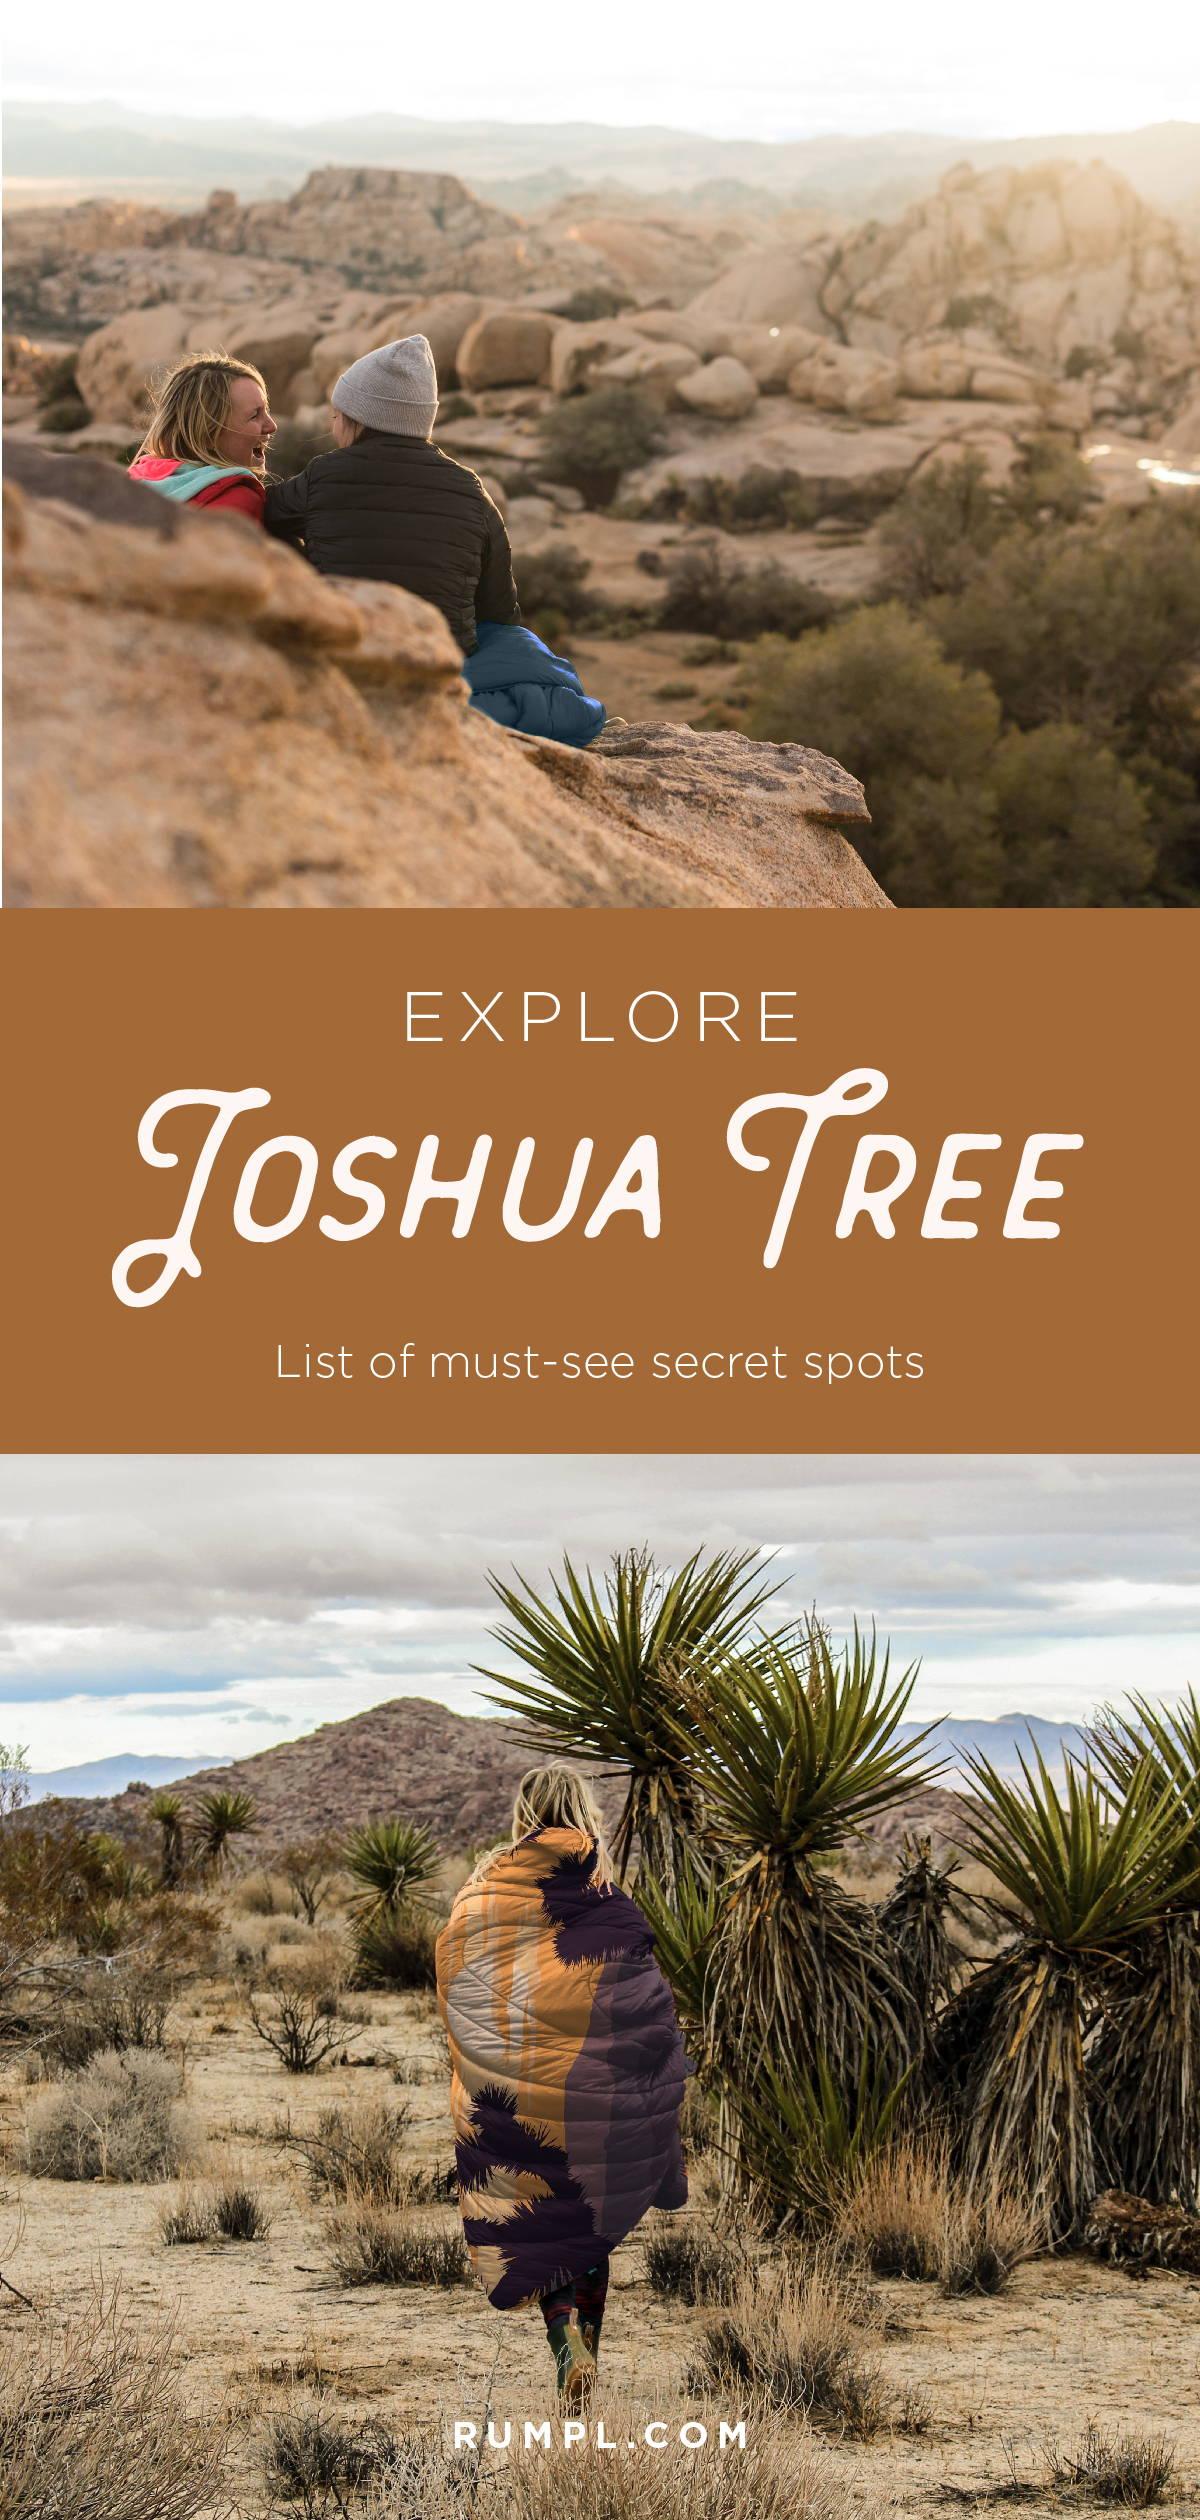 Explore Joshua Tree